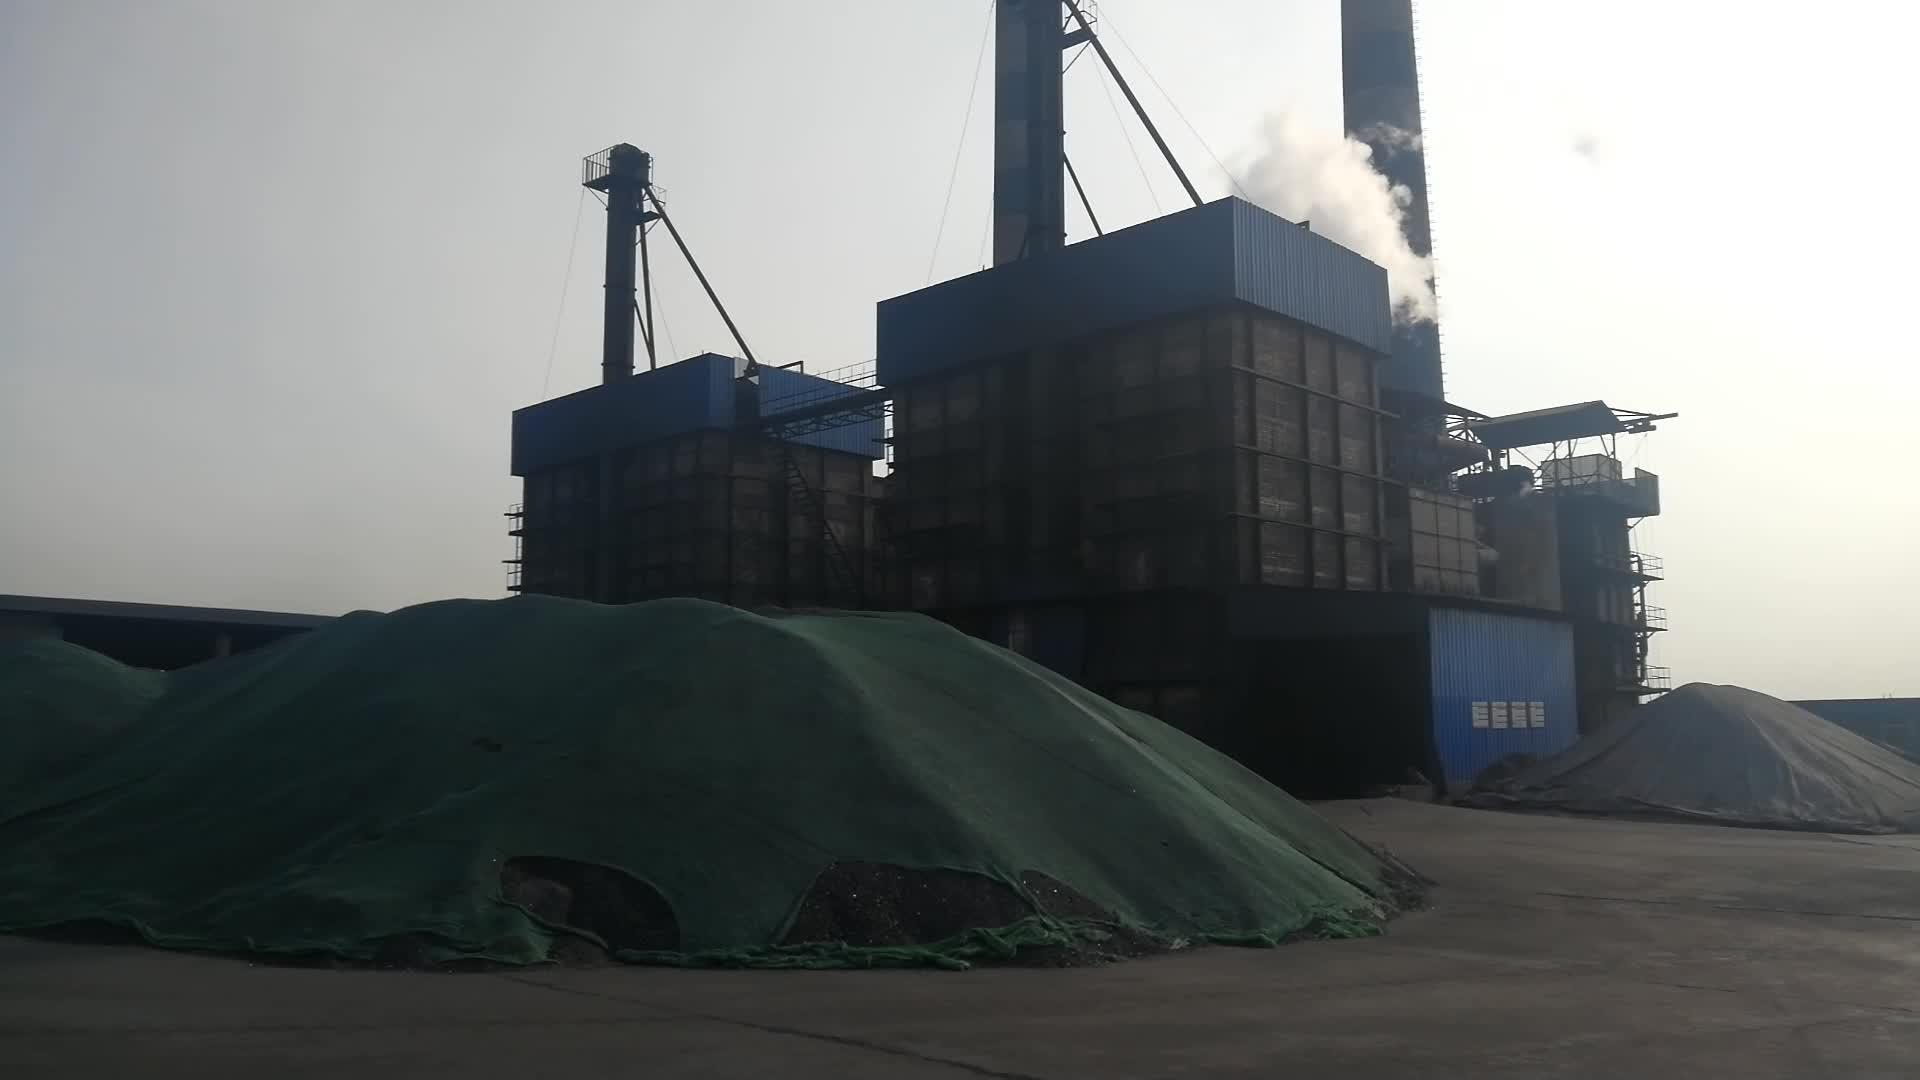 3mm coal based 1000 high iodine value Columnar granular activated carbon for dust mask